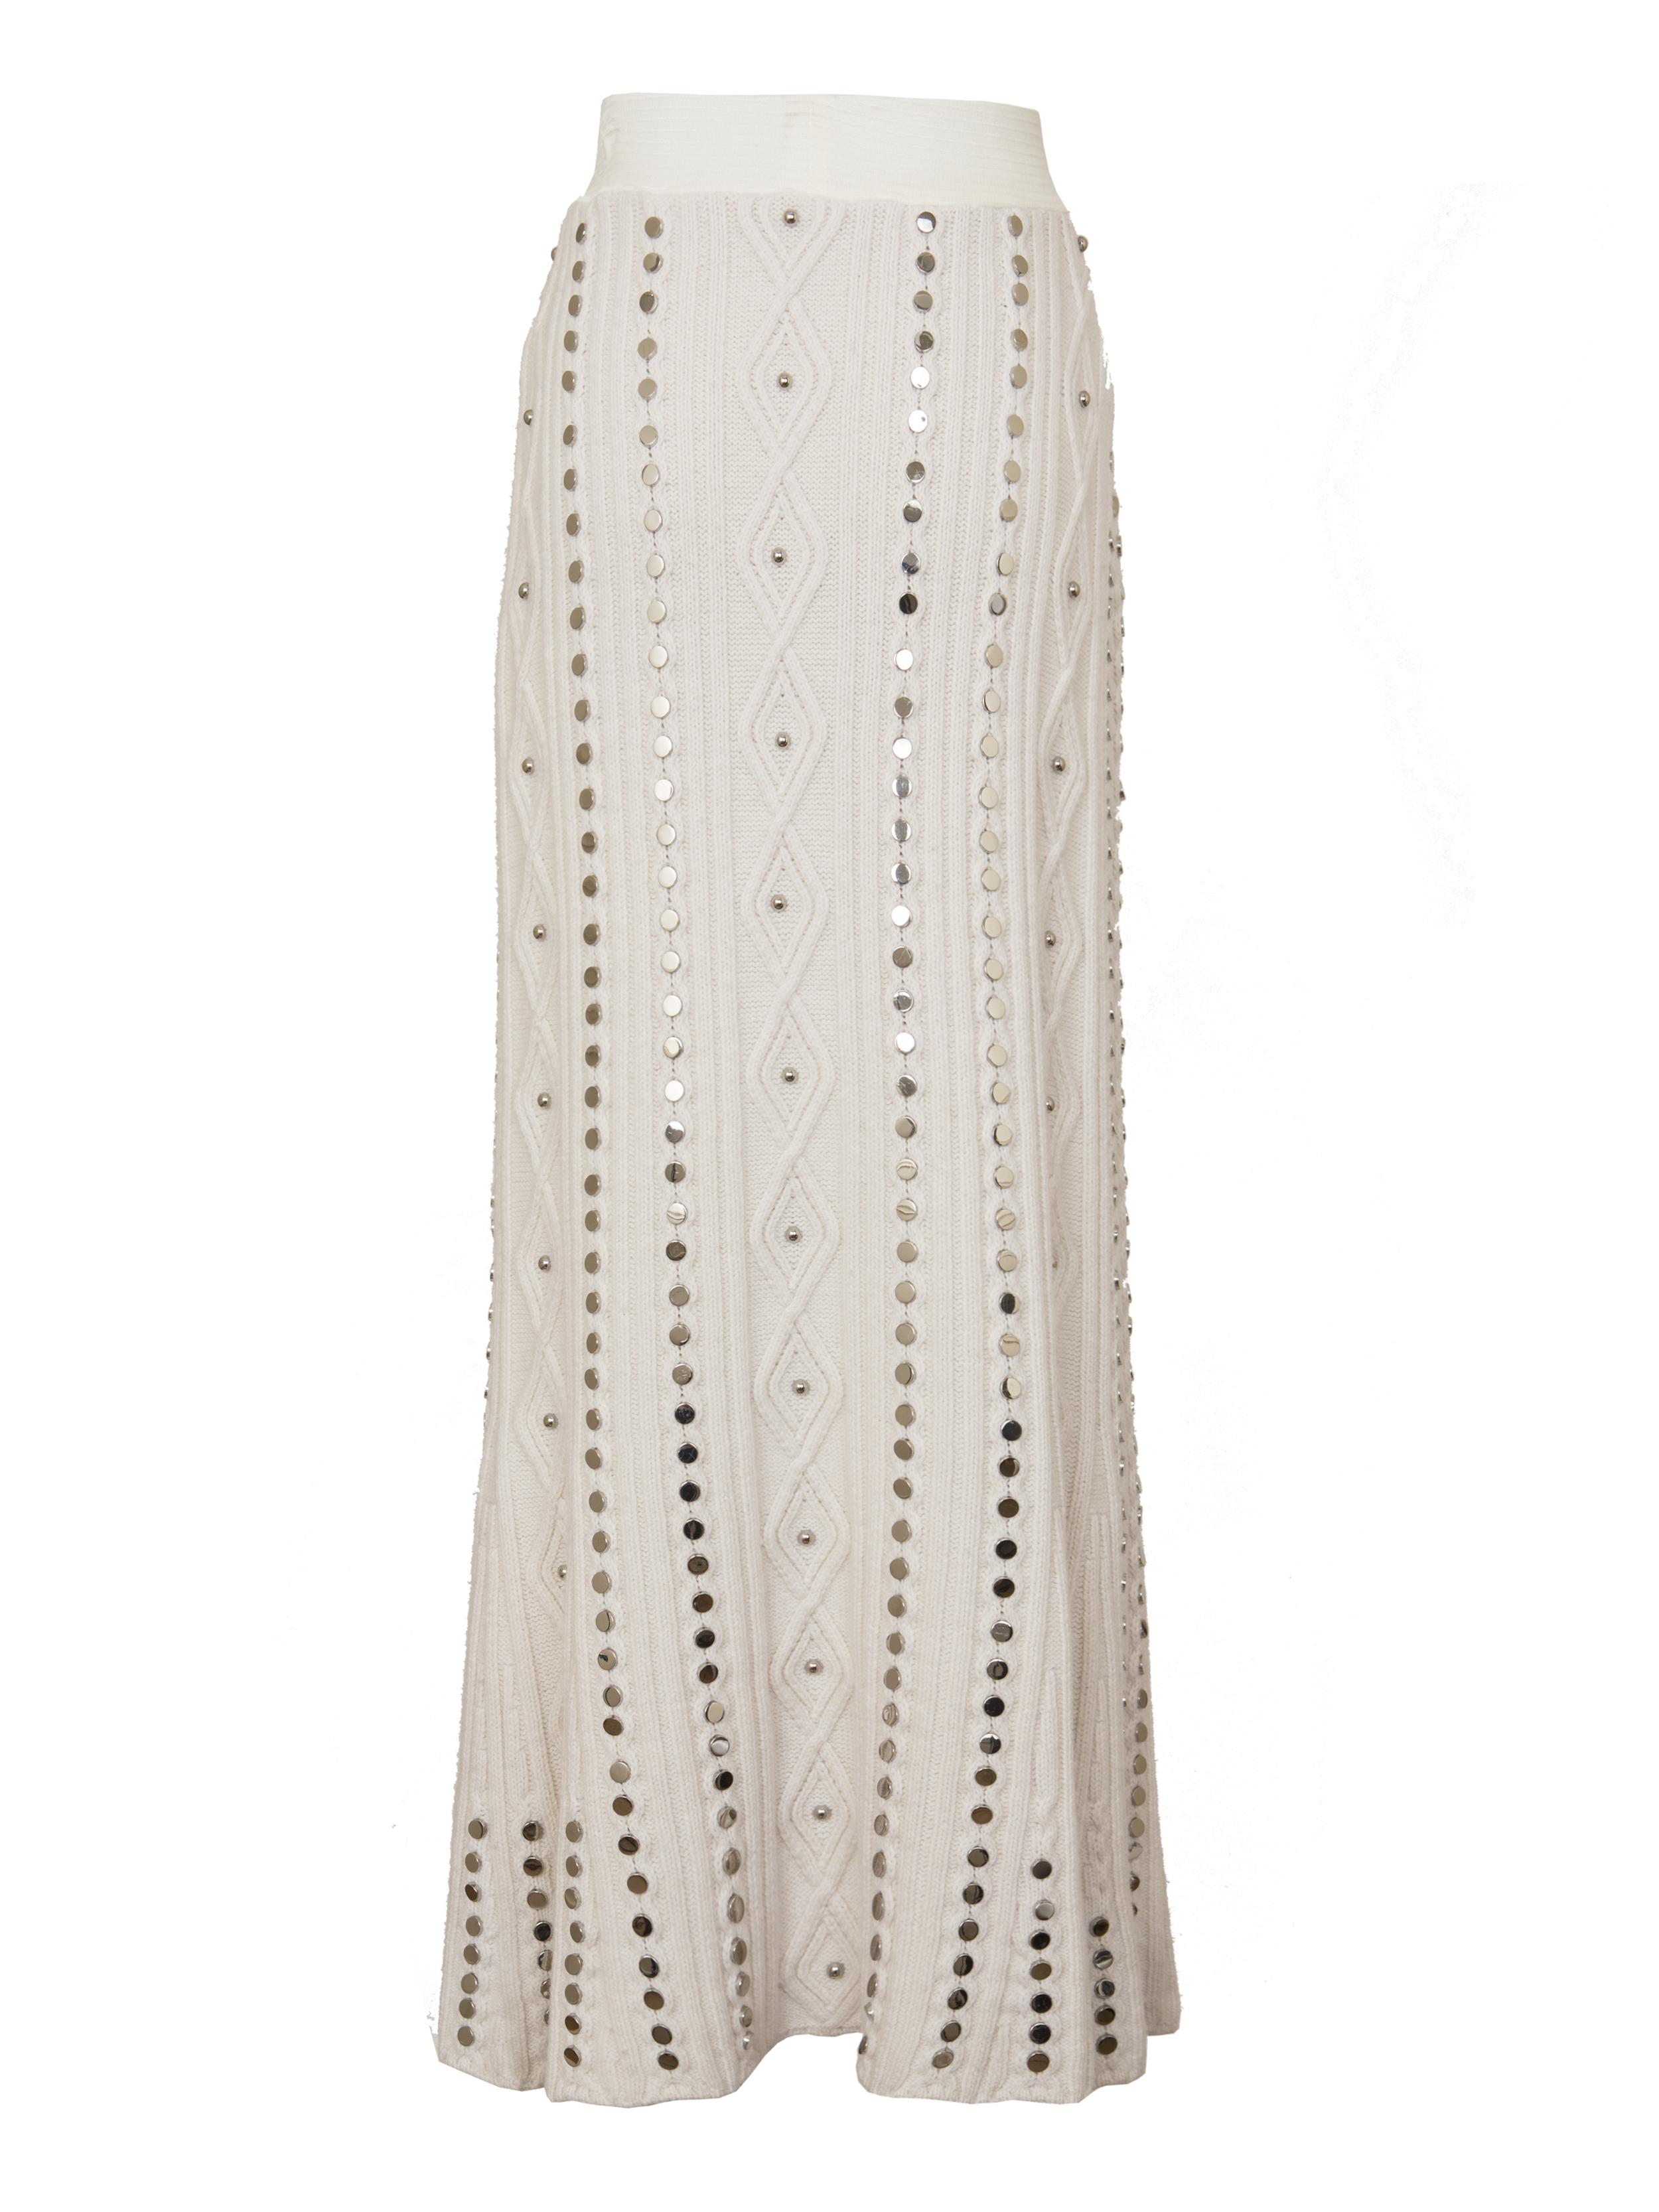 P3097-K, Beaded Rib Knit Skirt, Ivory.jpg